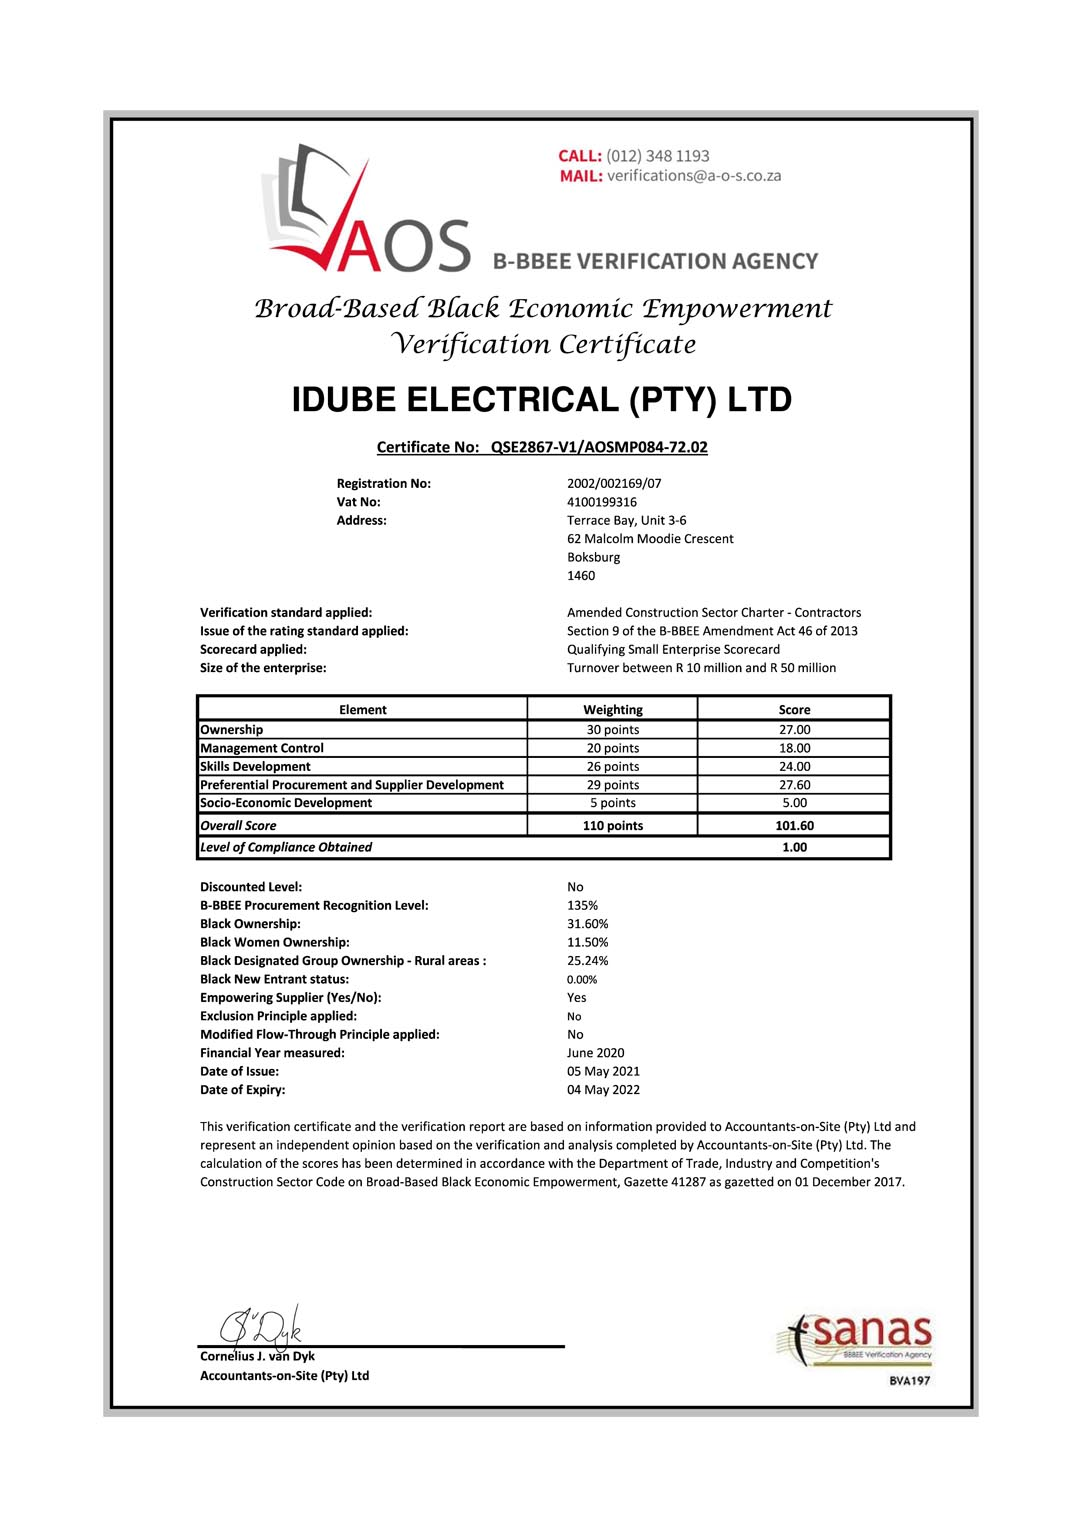 Idube Electrical B-BBEE Certificate